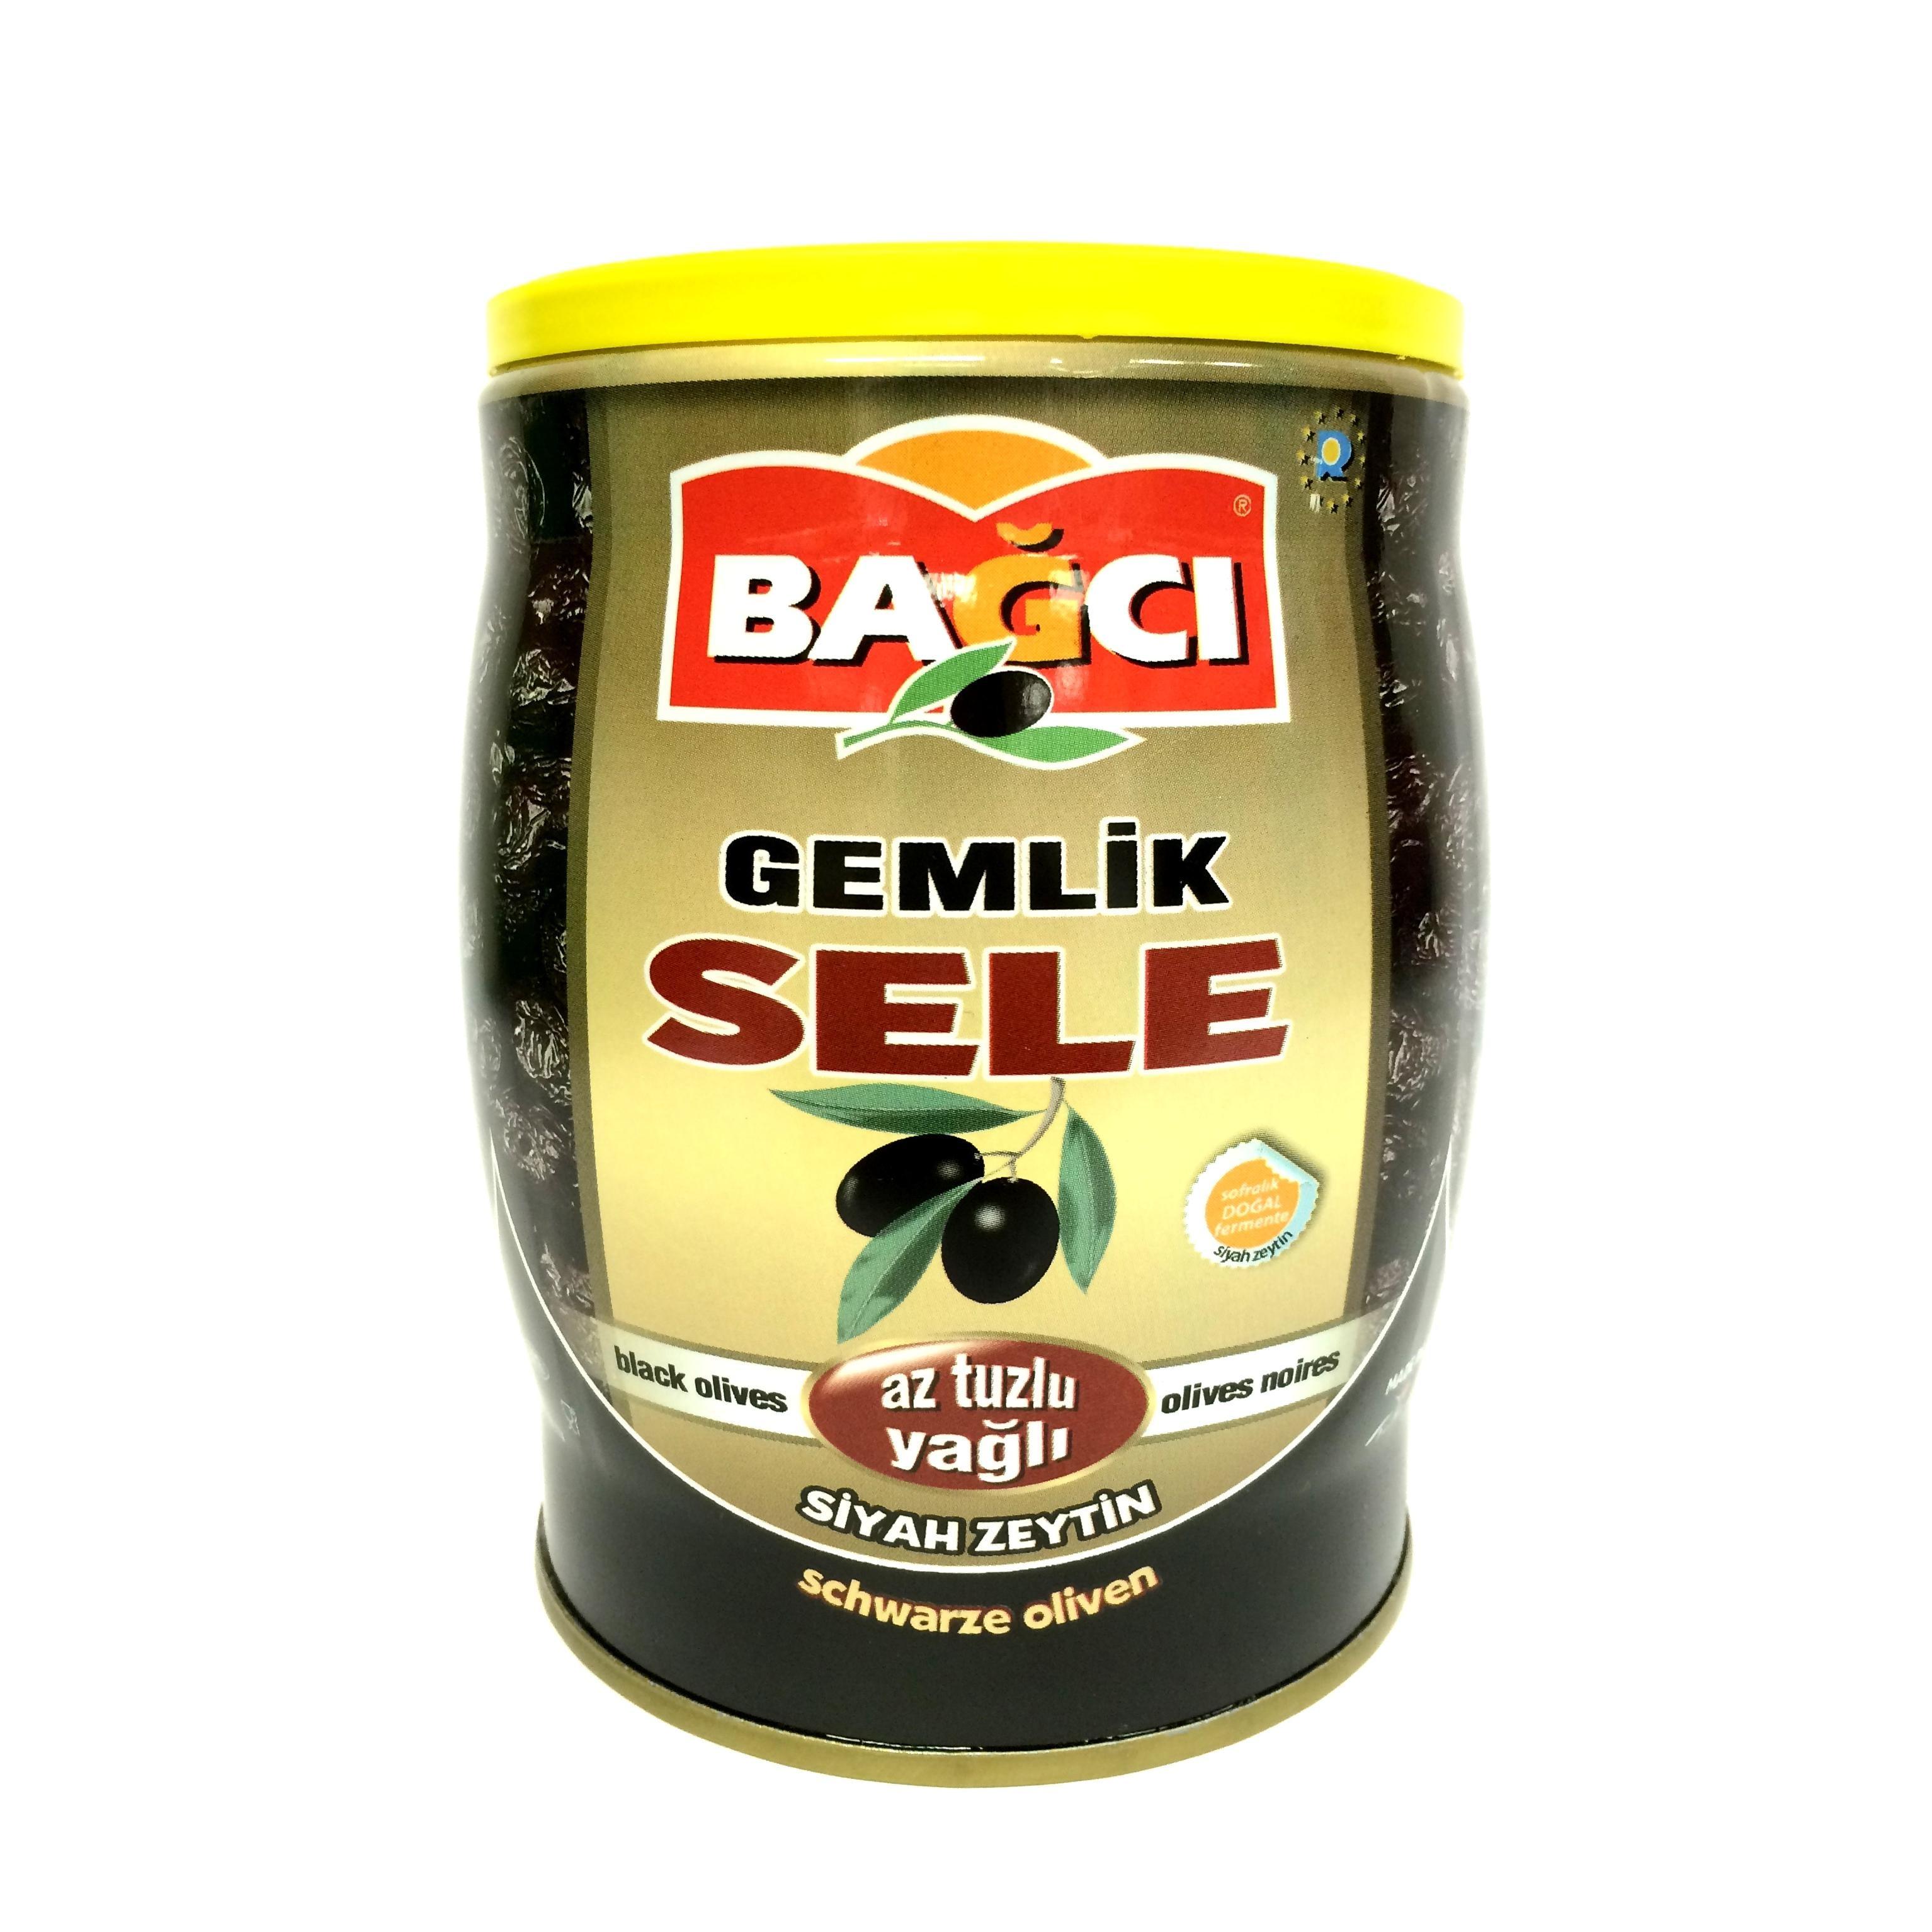 Bagci schwarze Oliven in Dose - Siyah SELE Zeytin 750g